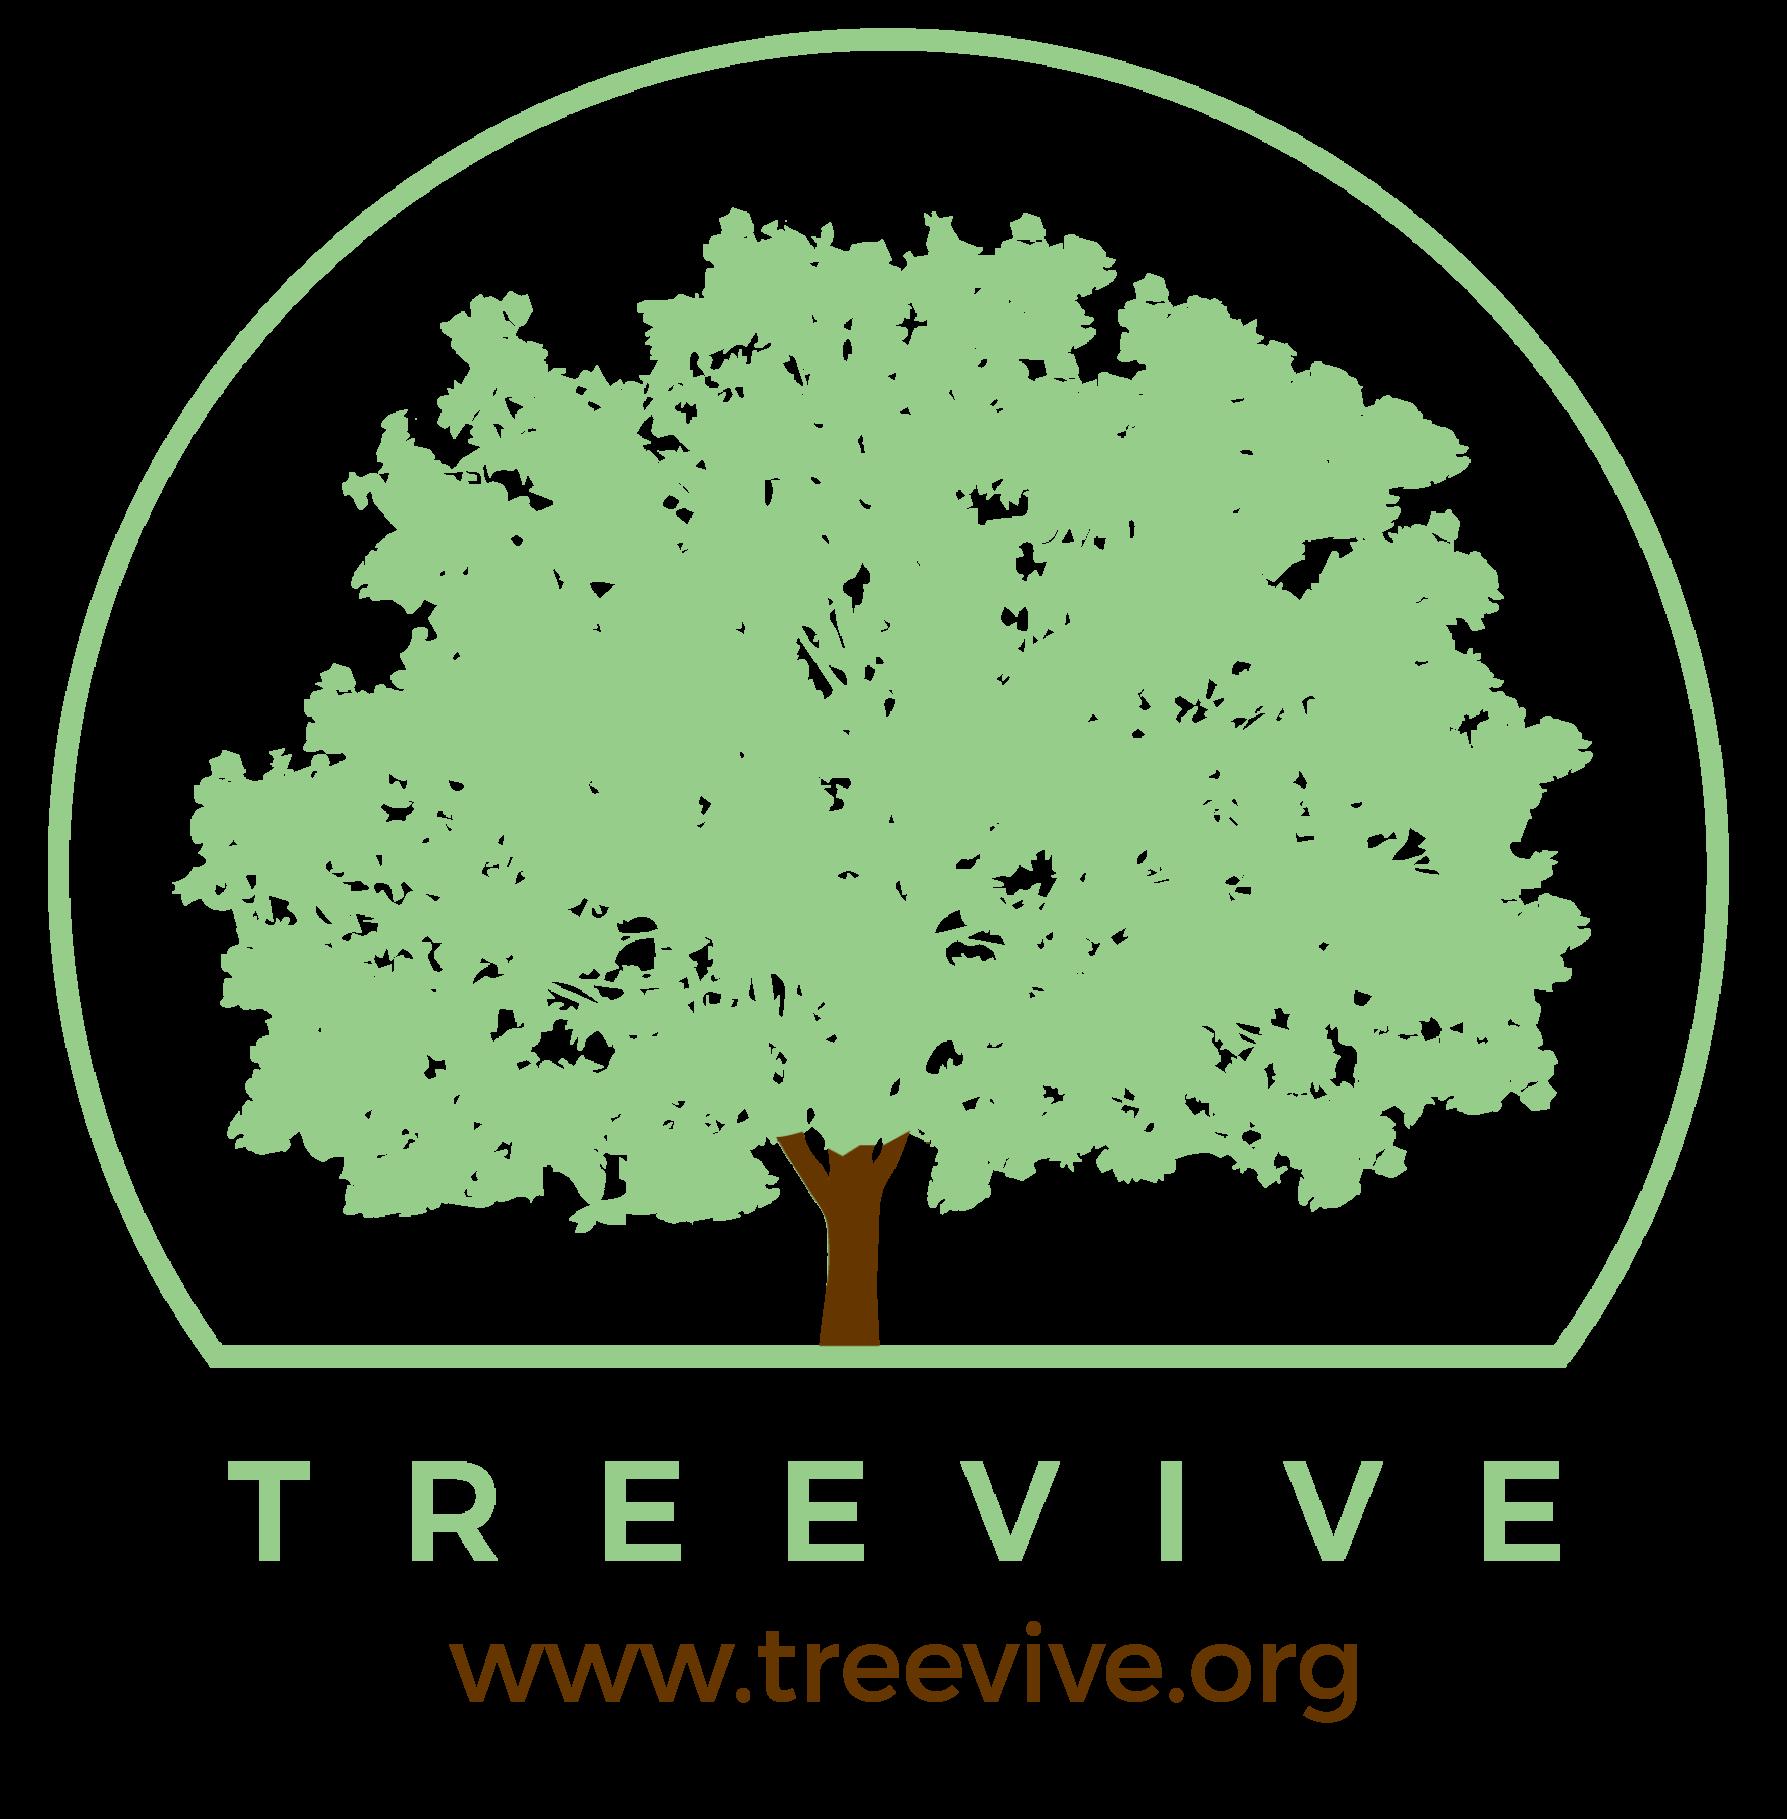 caroline henry natur treevive logo